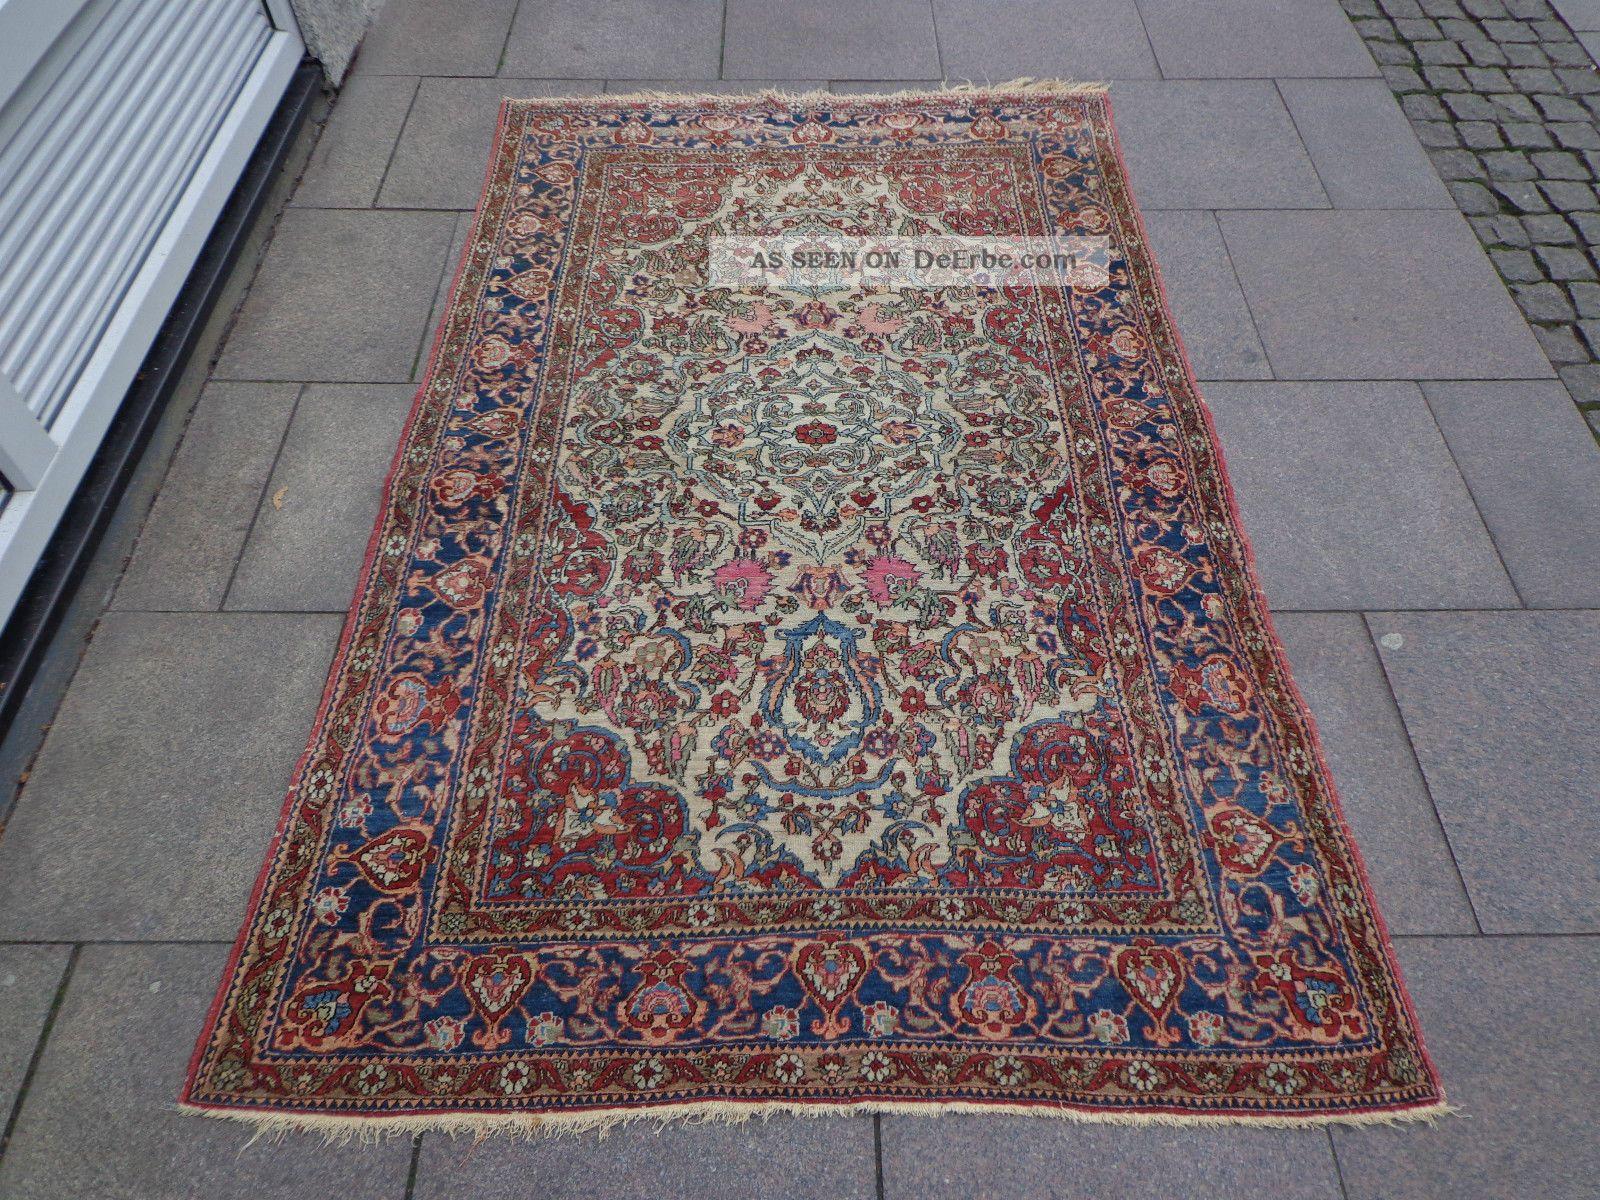 Orientteppich antik  Teppiche & Flachgewebe - Antiquitäten